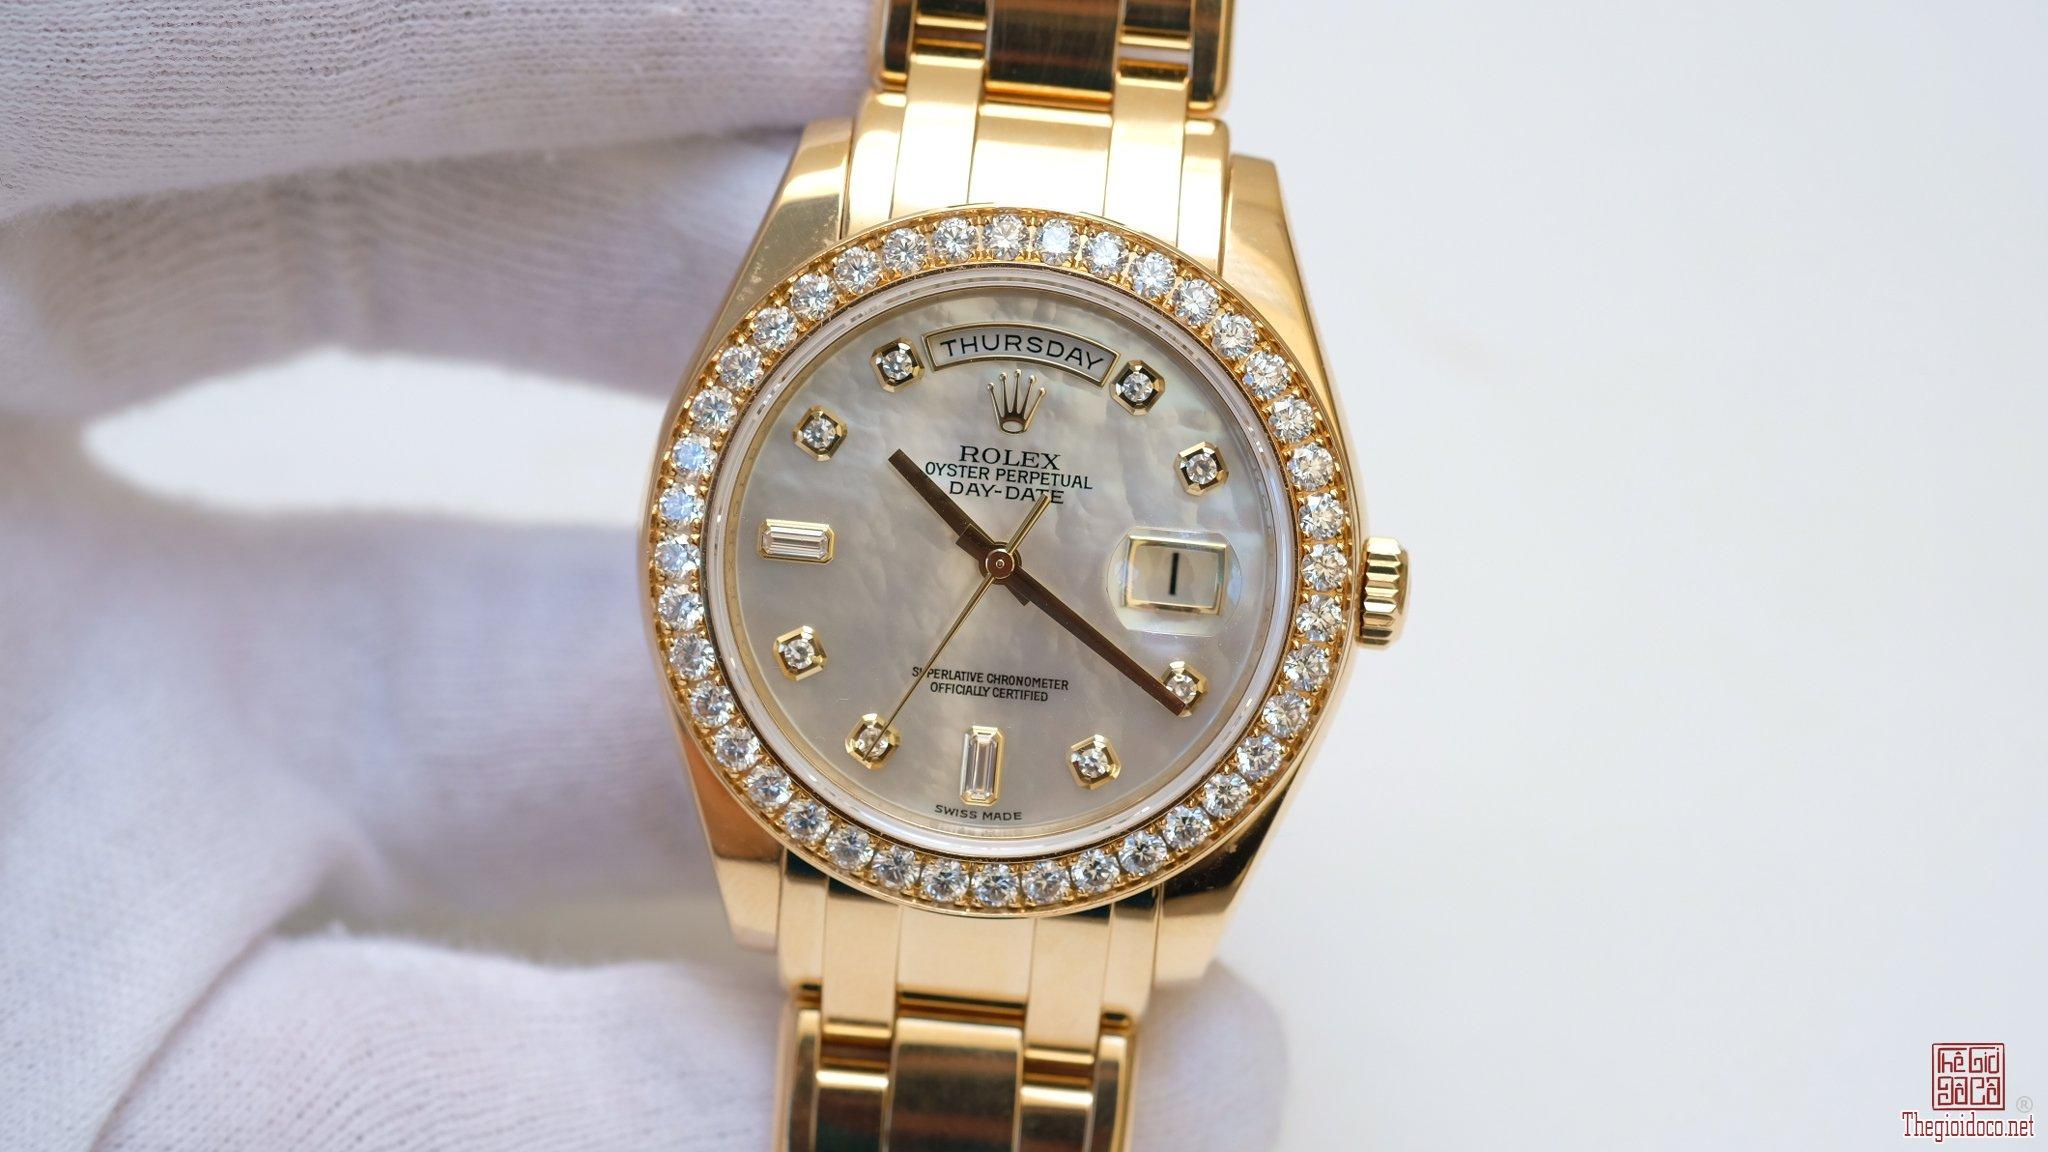 Đồng hồ Rolex Day Date 18948 mặt xà cừ size 39mm